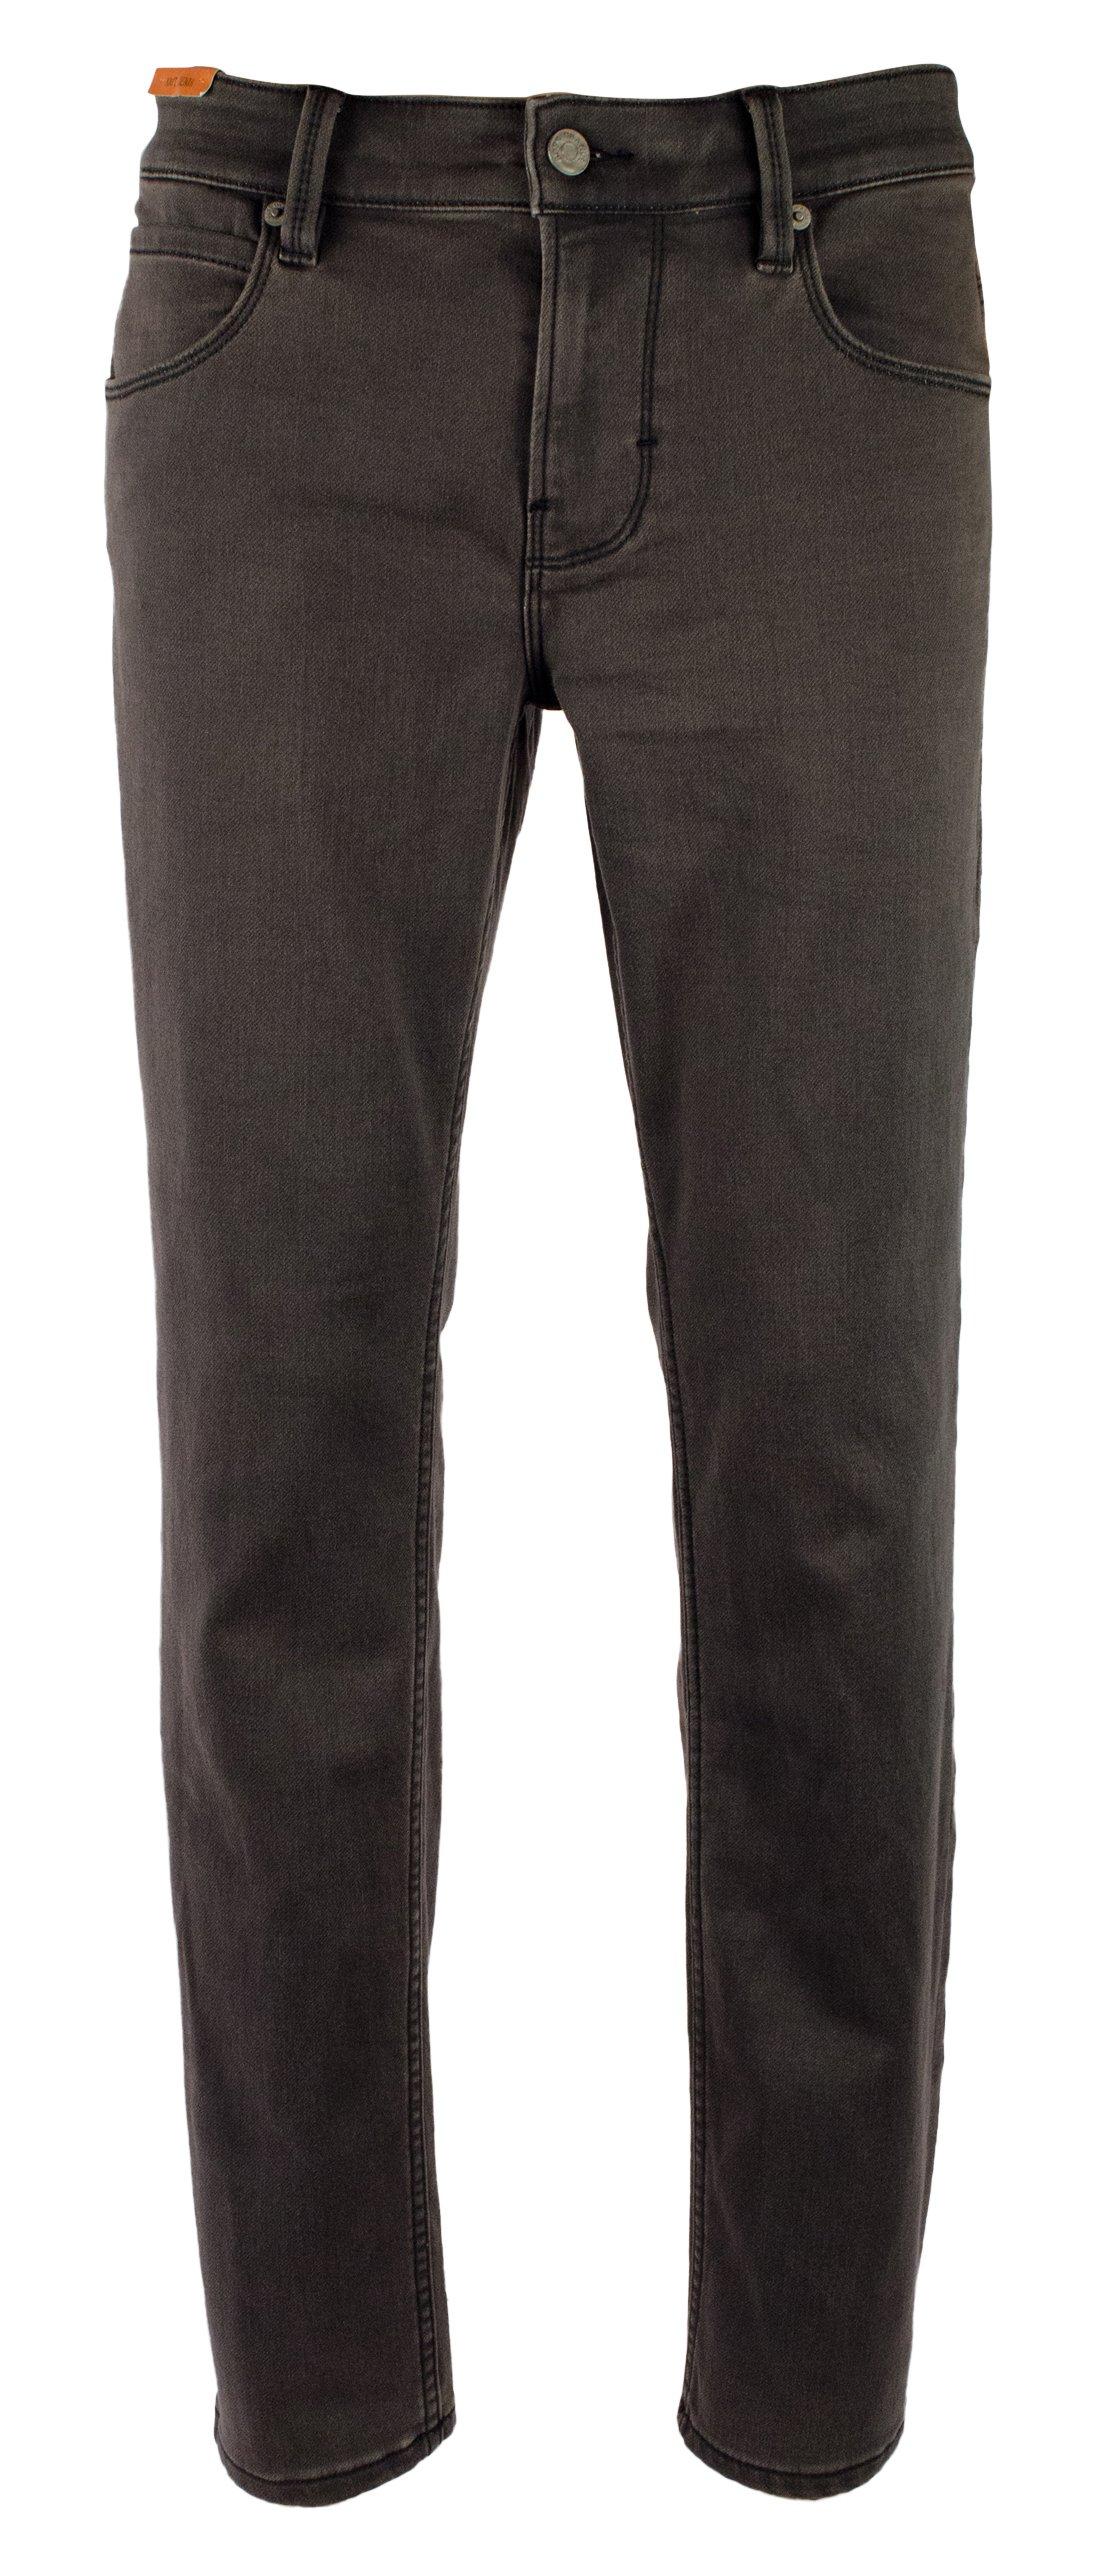 Hugo Boss Men's Orange Label Modern Stretch Slim Fit Knit Denim Jeans-C-38Wx32L